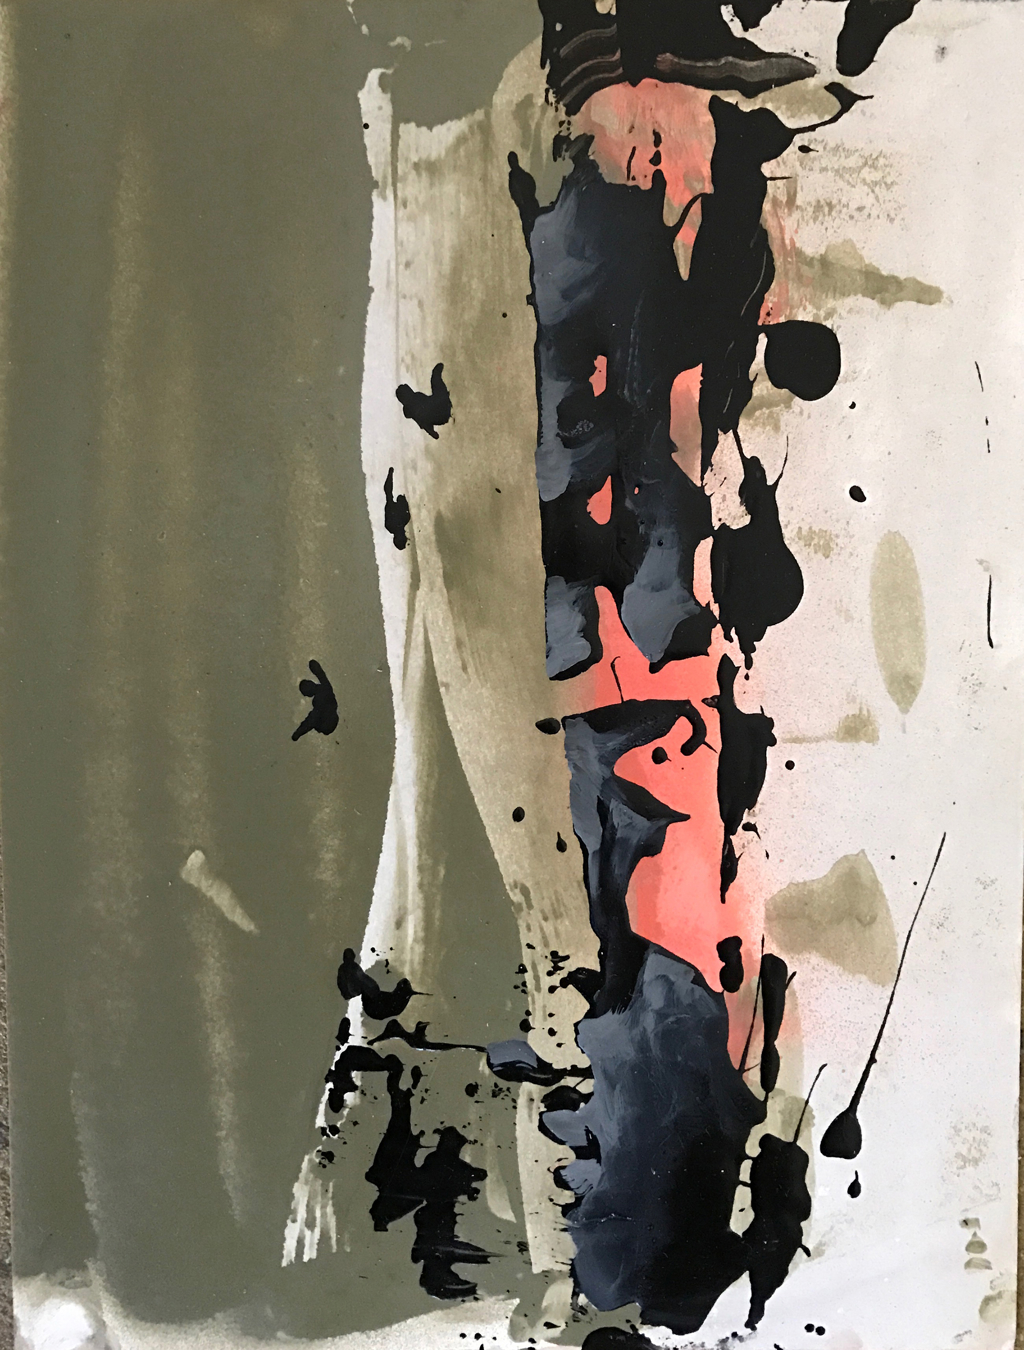 Tumblers by Marcus Jansen (b. 1968)